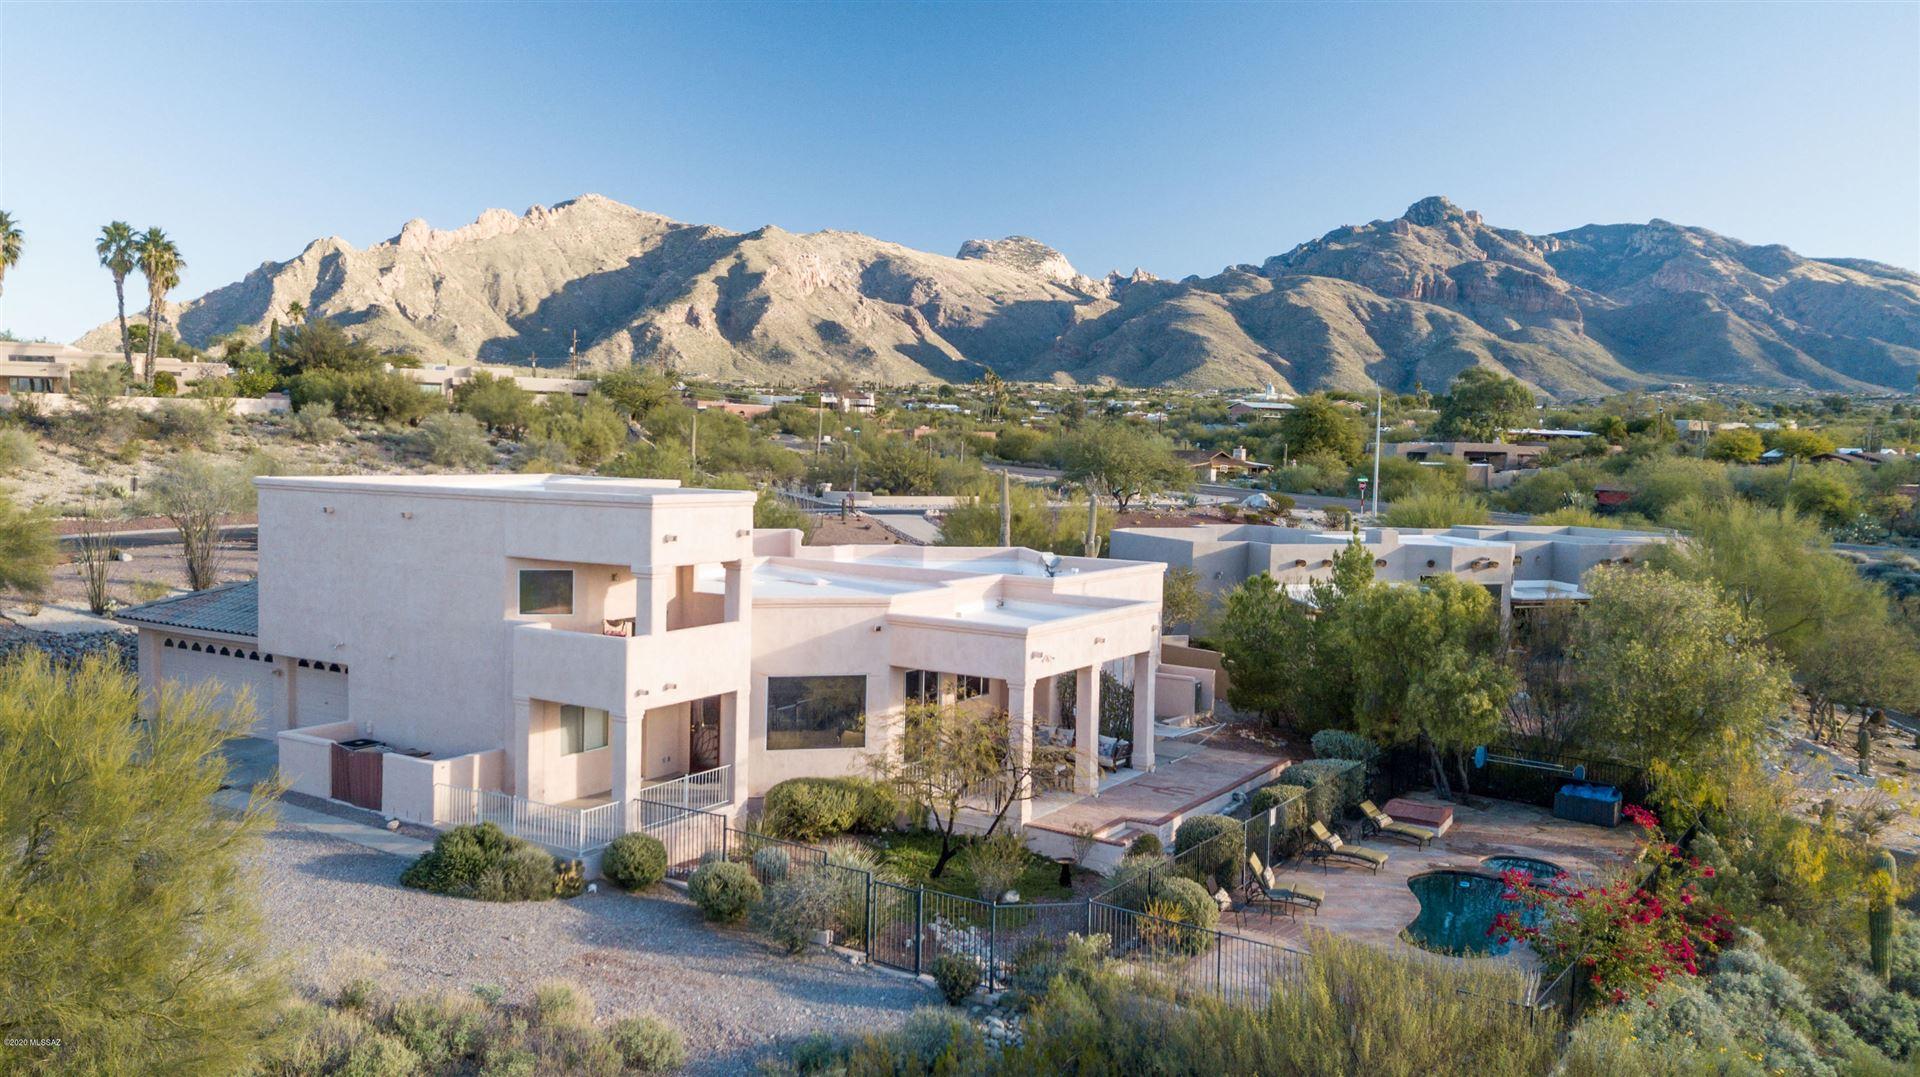 6770 N Shadow Run Drive, Tucson, AZ 85704 - MLS#: 22008767